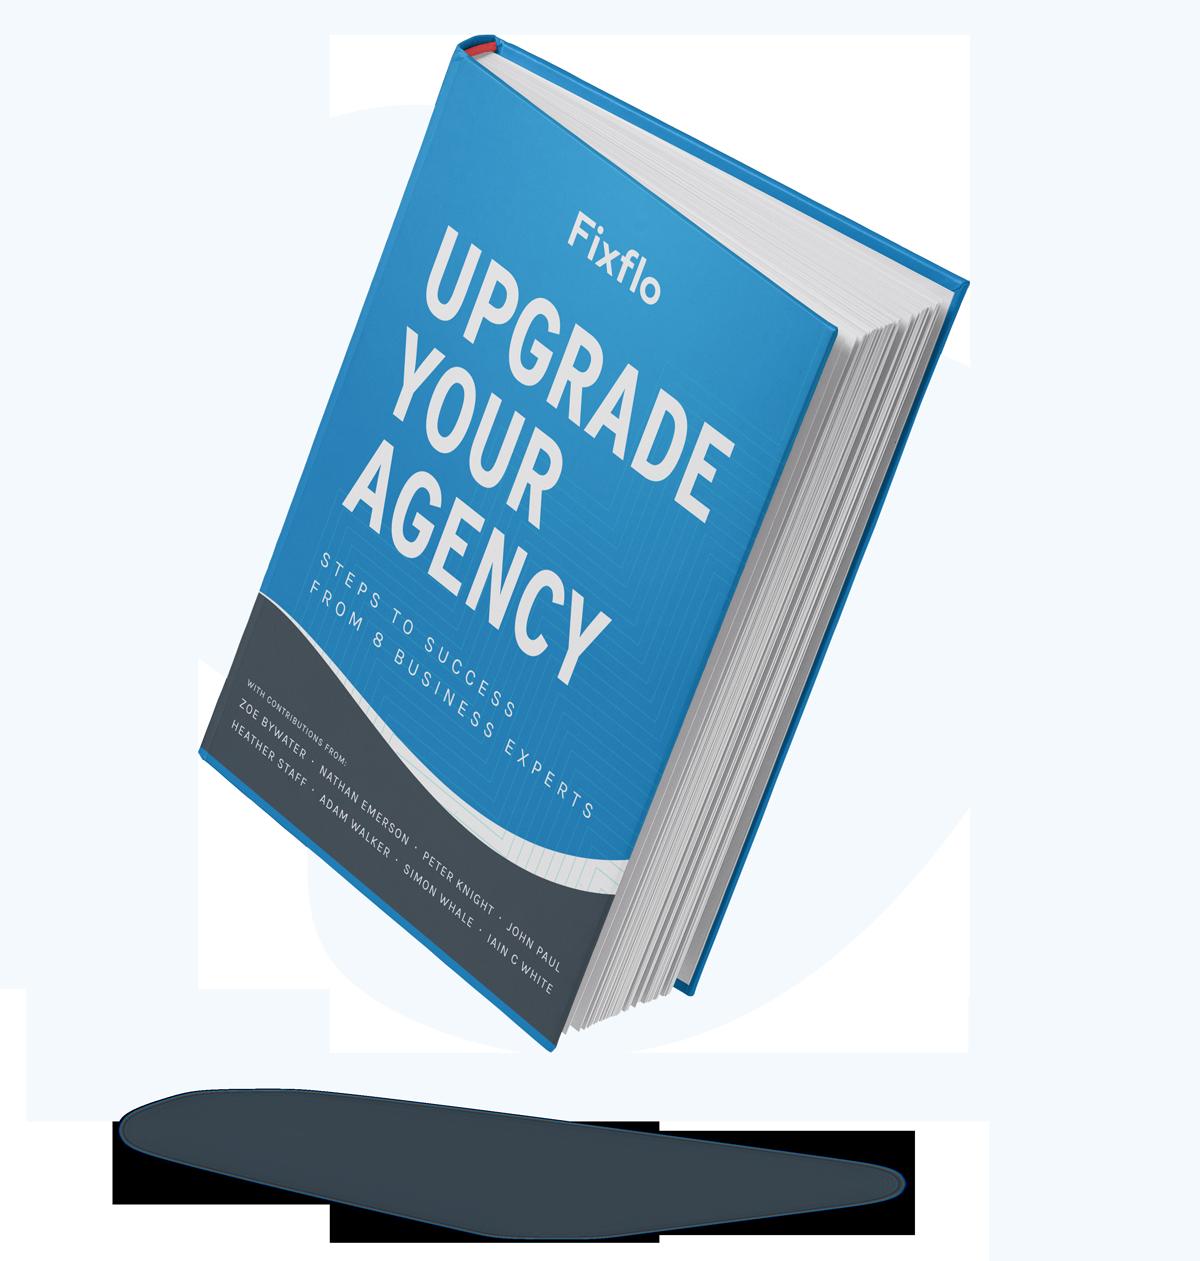 Upgrade-your-Agency_LP_v2